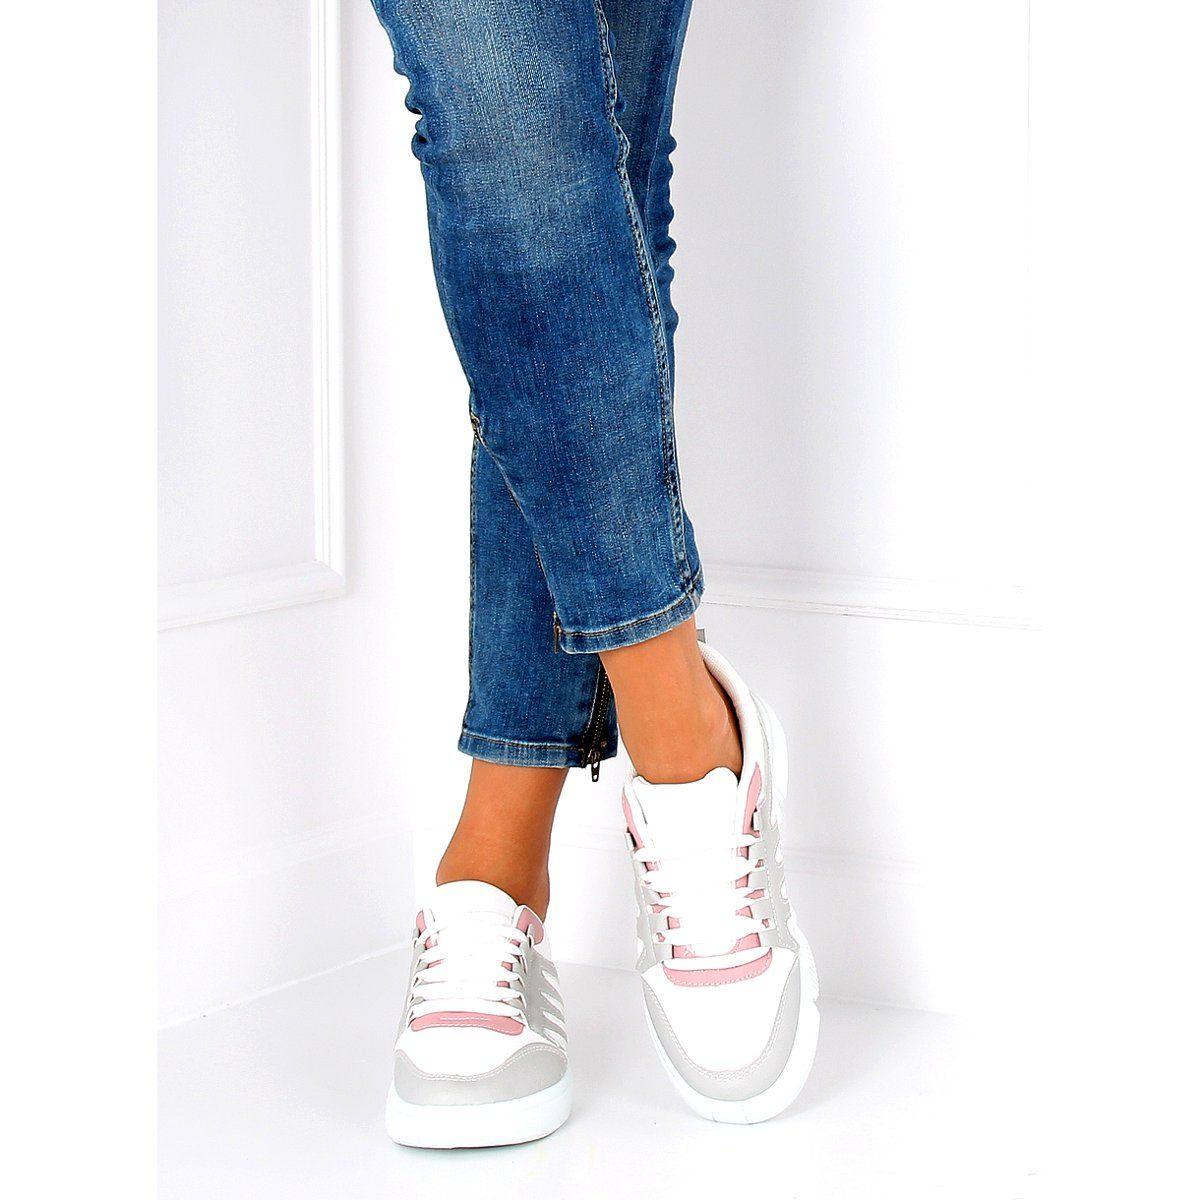 Buty Sportowe Bialo Szare Bl150p Grey Biale Women Shoes Shoes Sport Shoes